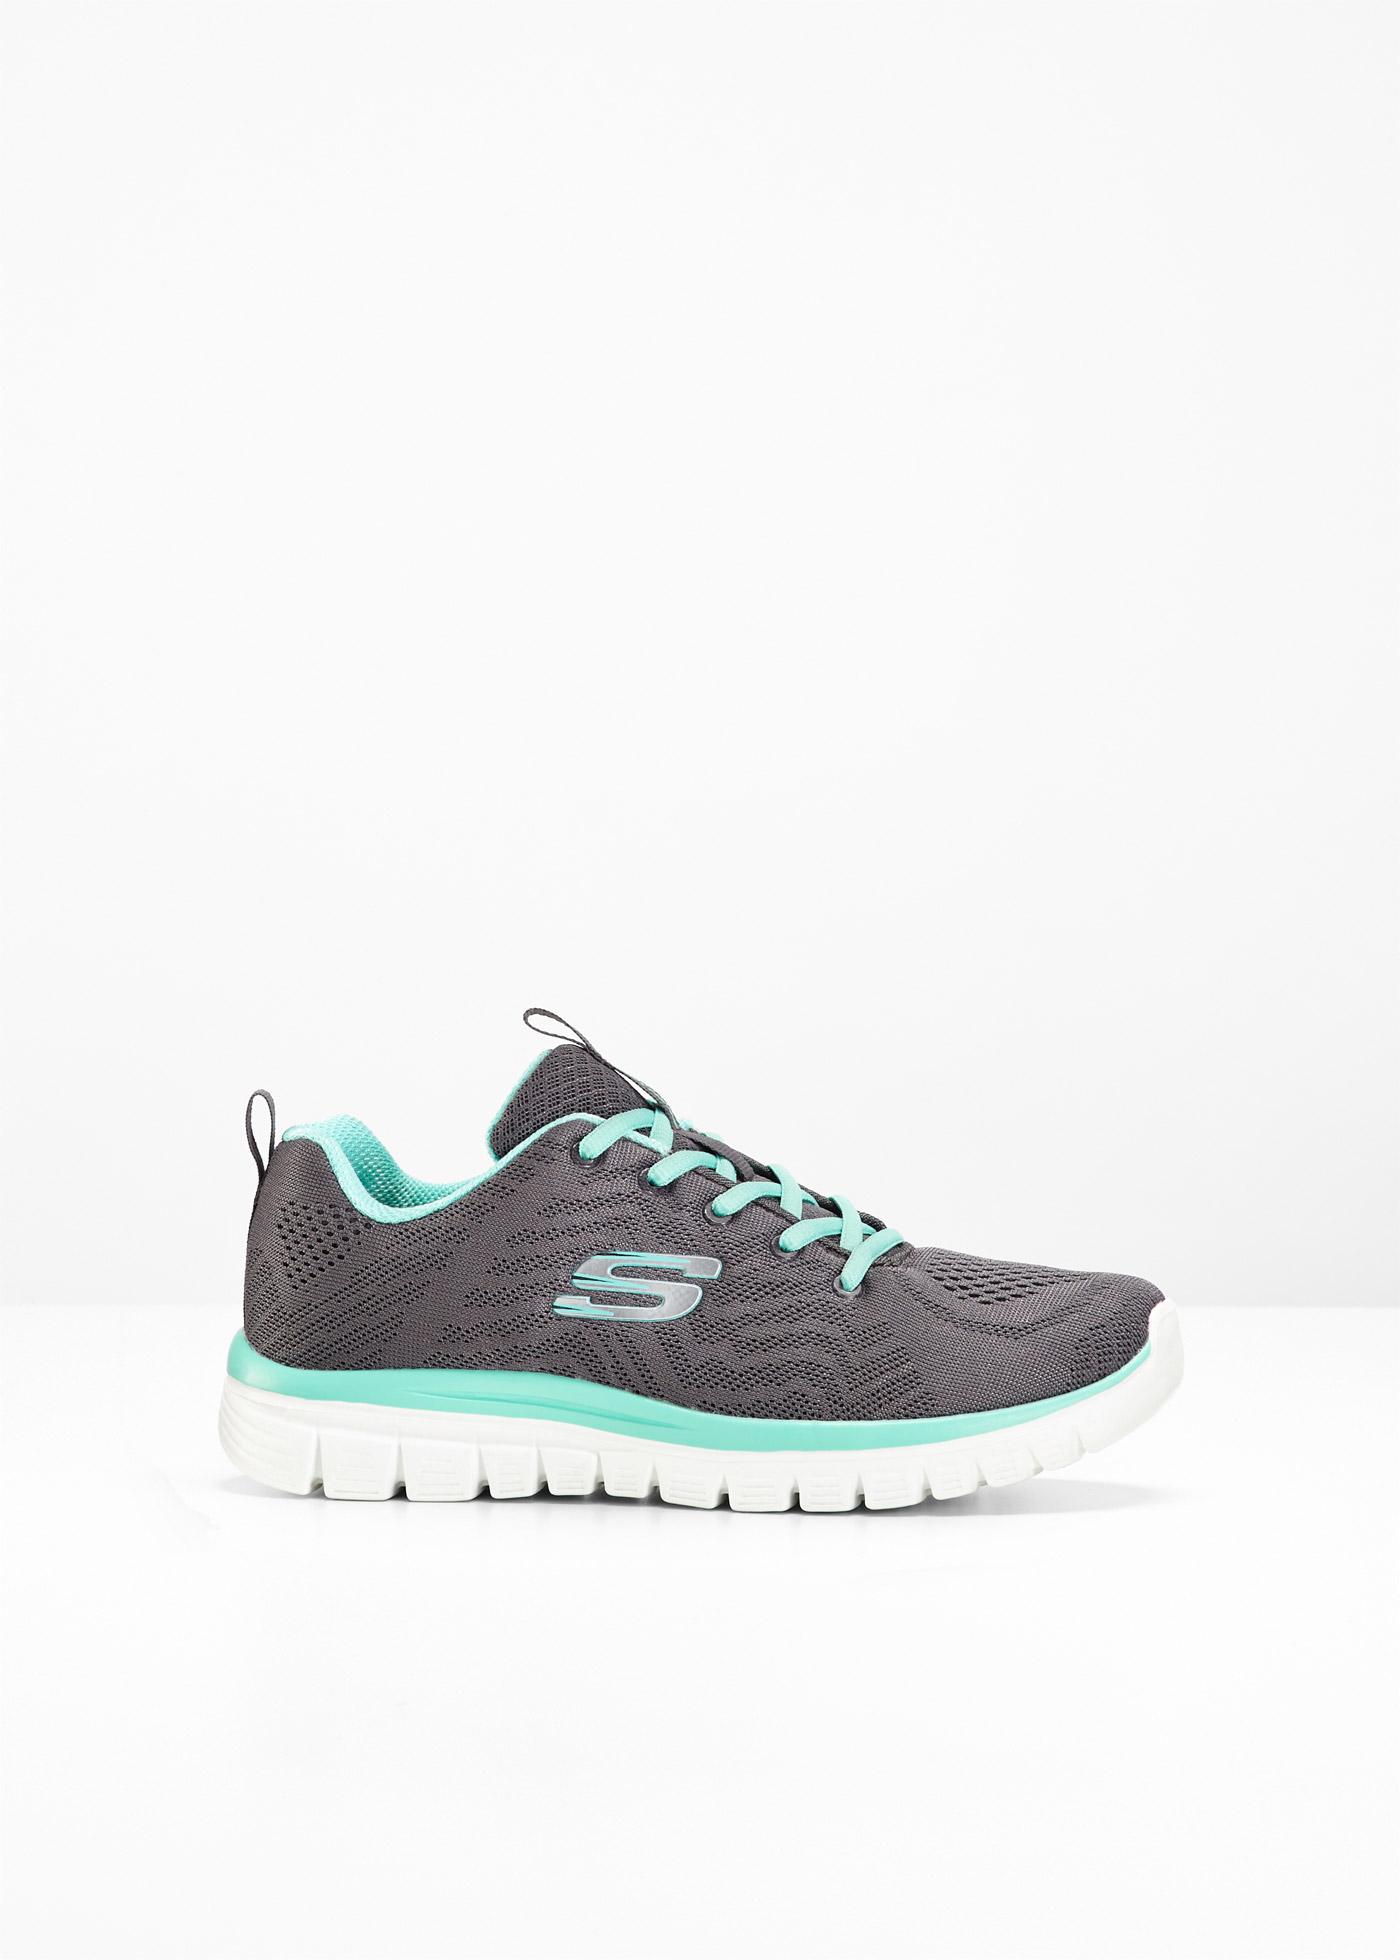 100% authentic 4f1e3 0c959 Farbenfroh und trendy: Sneaker von Skechers mit Memory Foam ...